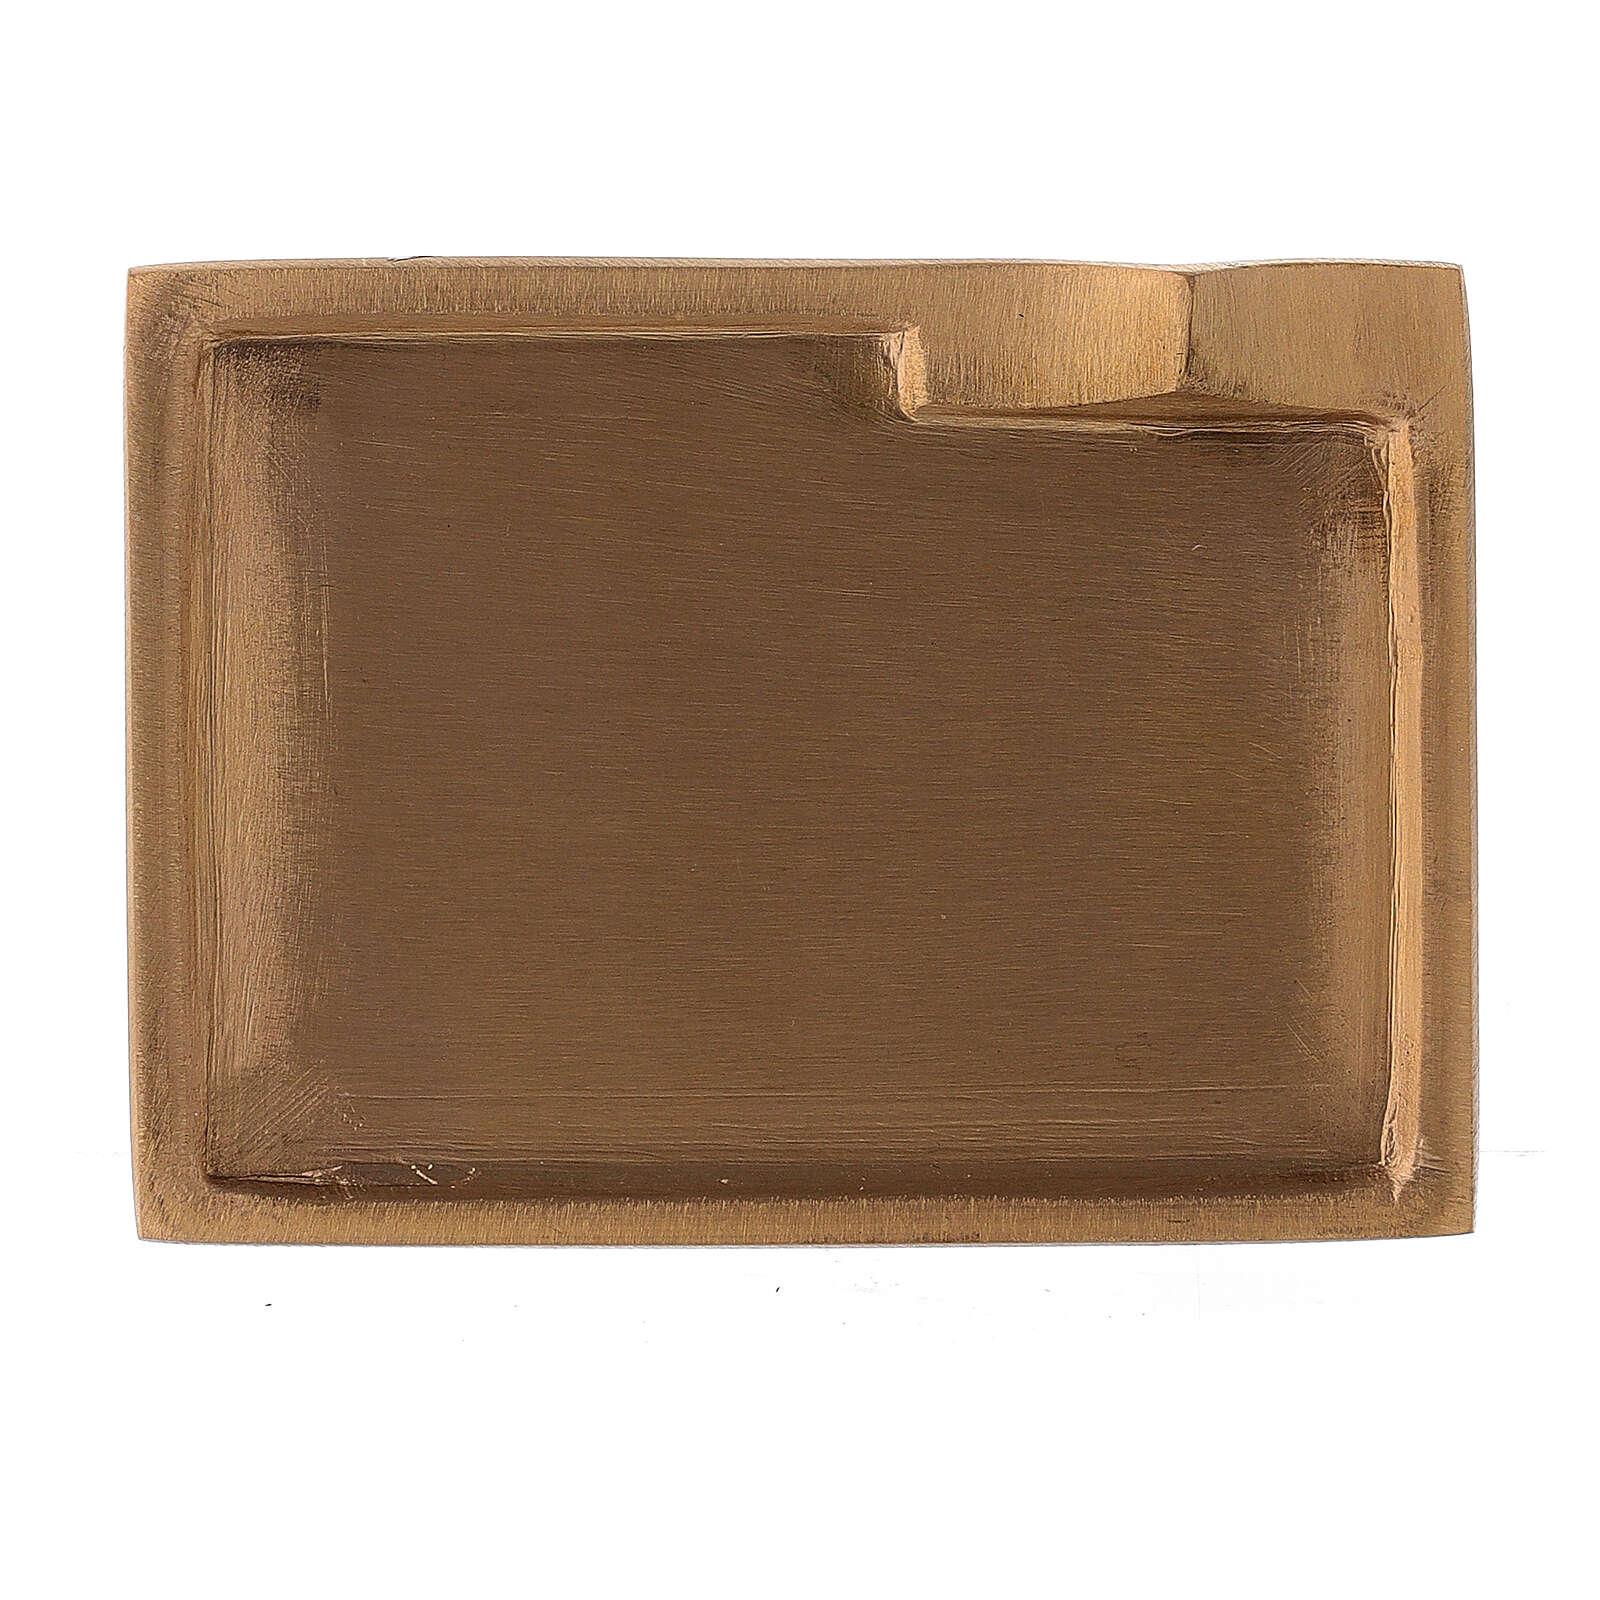 Rectangular candle holder plate satin finish brass 3 1/2x2 1/2 in 3